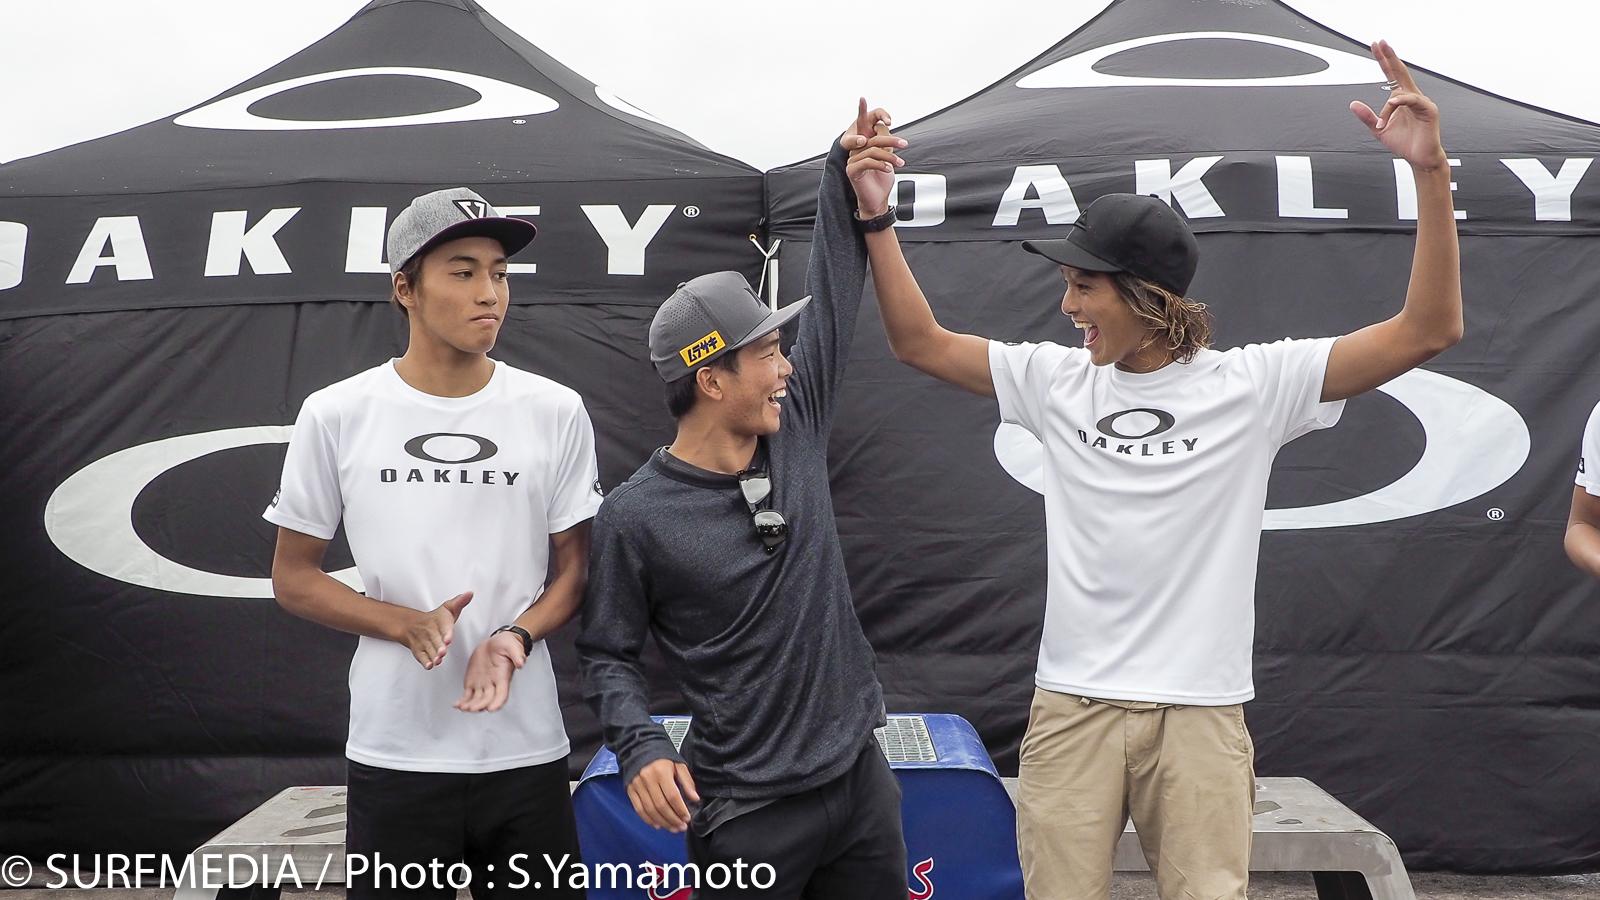 AA-Boys(アンダー16)で優勝した平原颯馬